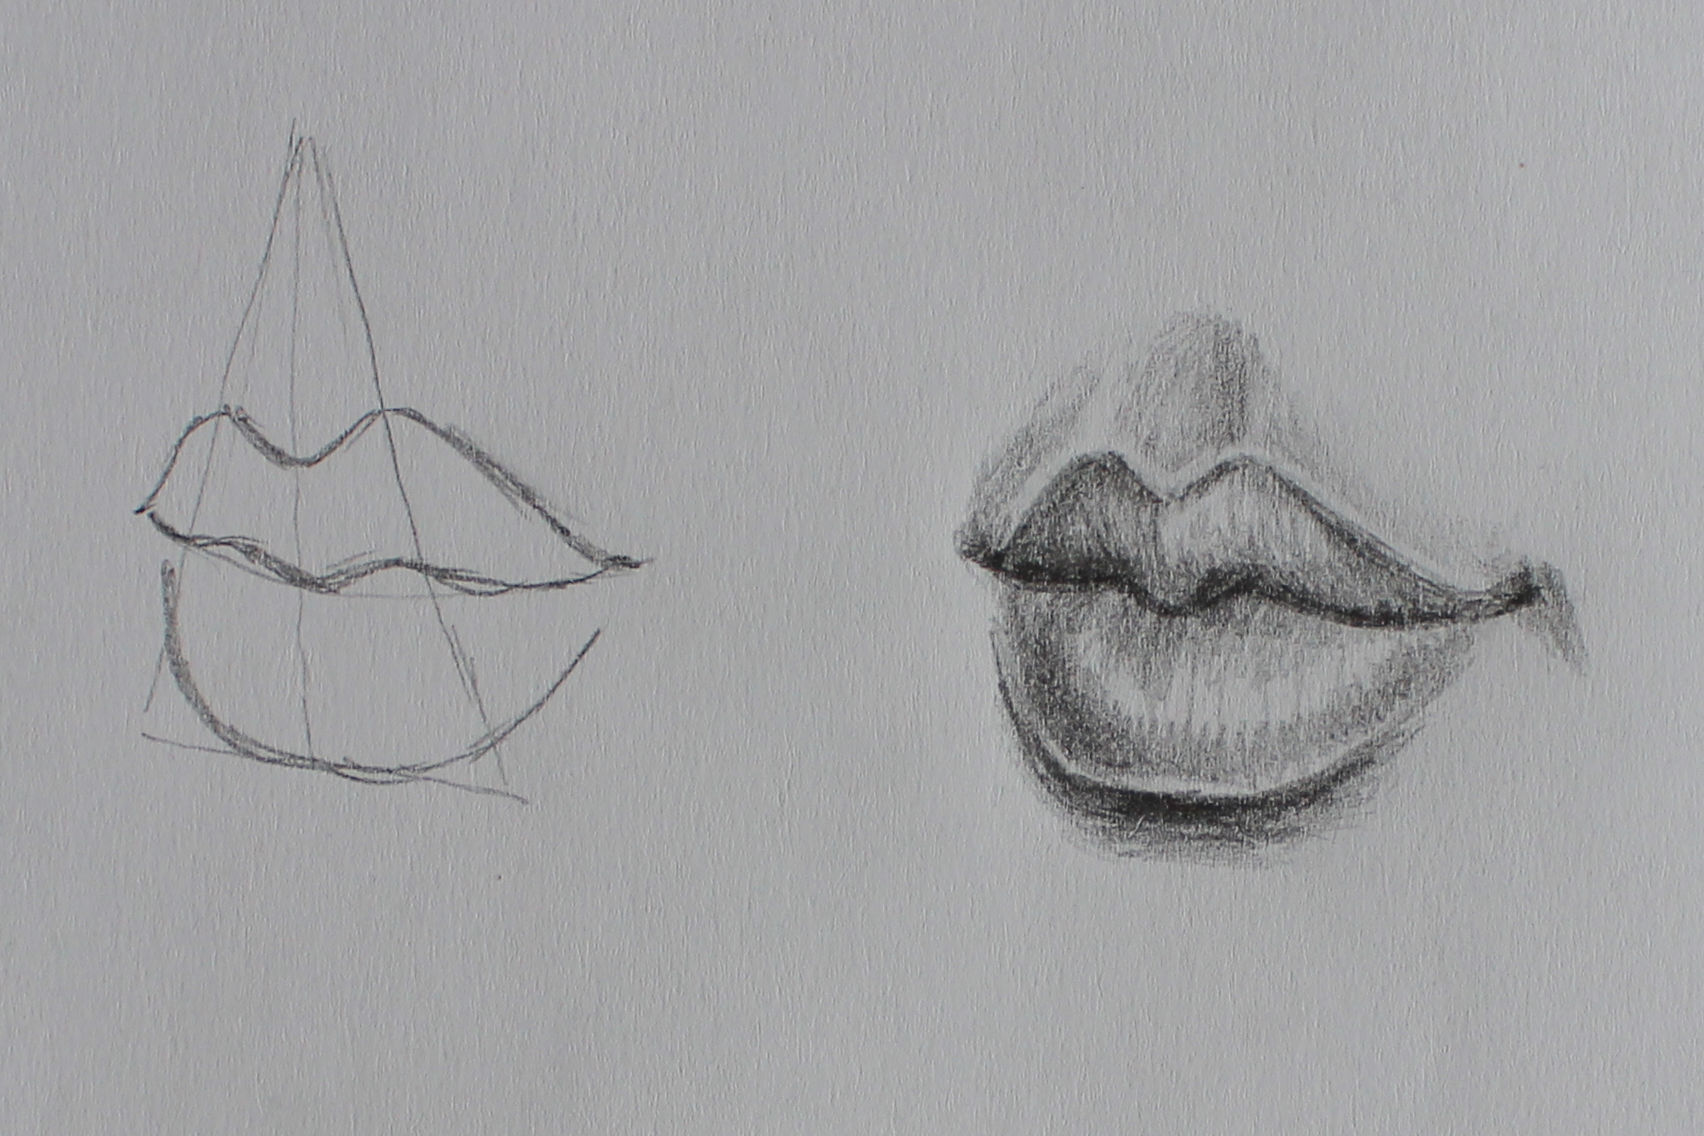 Jak Na Usta Malujeme S Usmevem